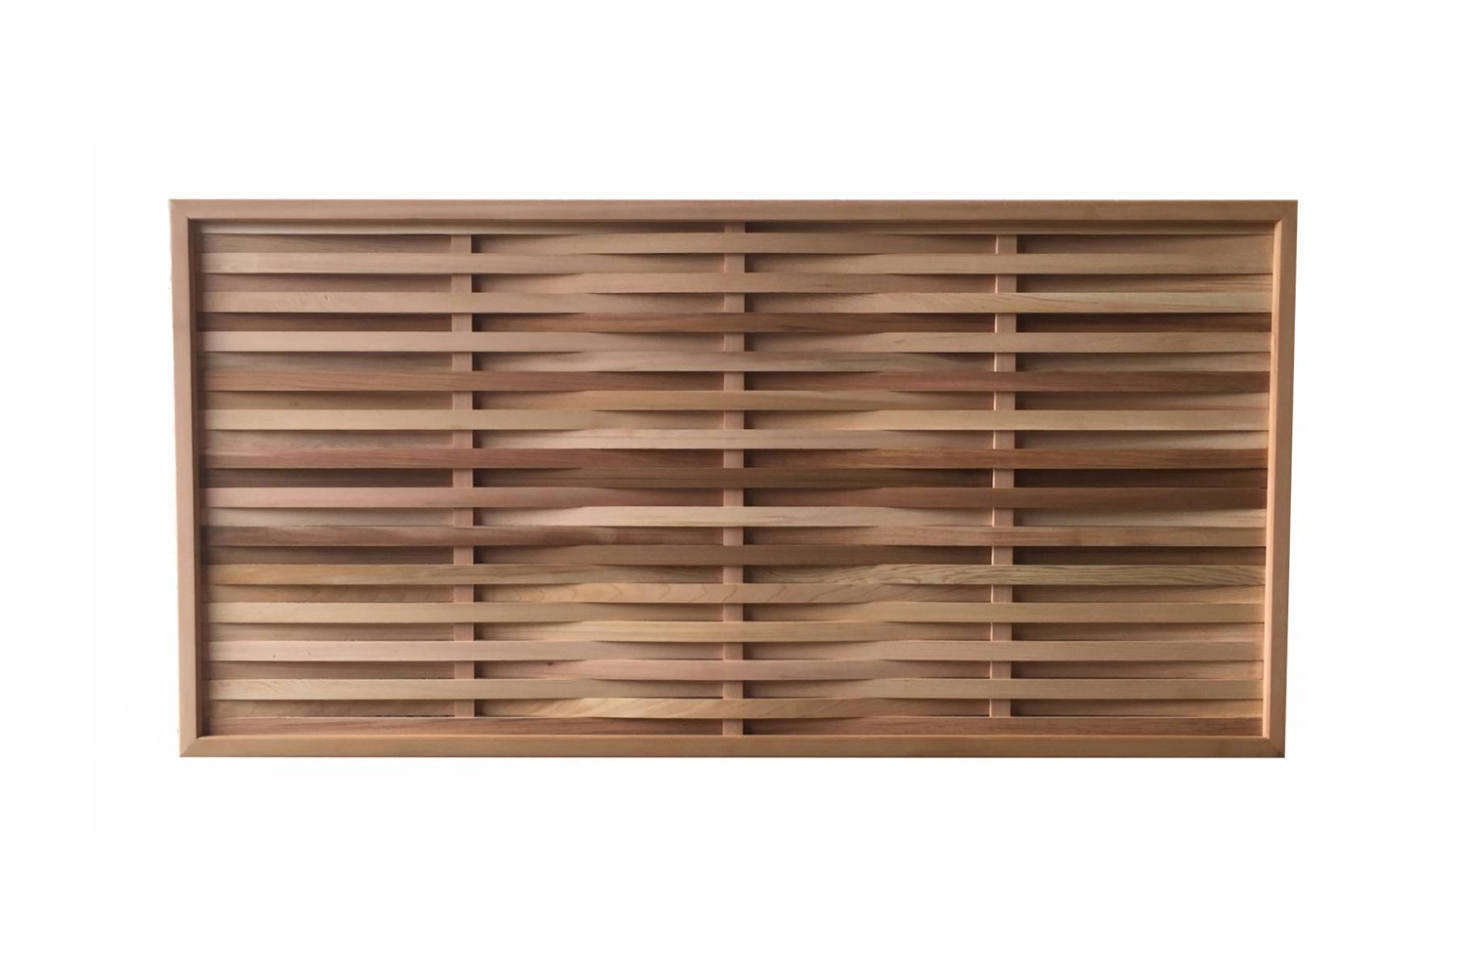 The Western Red Cedar Prestige Weave Panels are £163 to £344 atGarden Trellis Co.